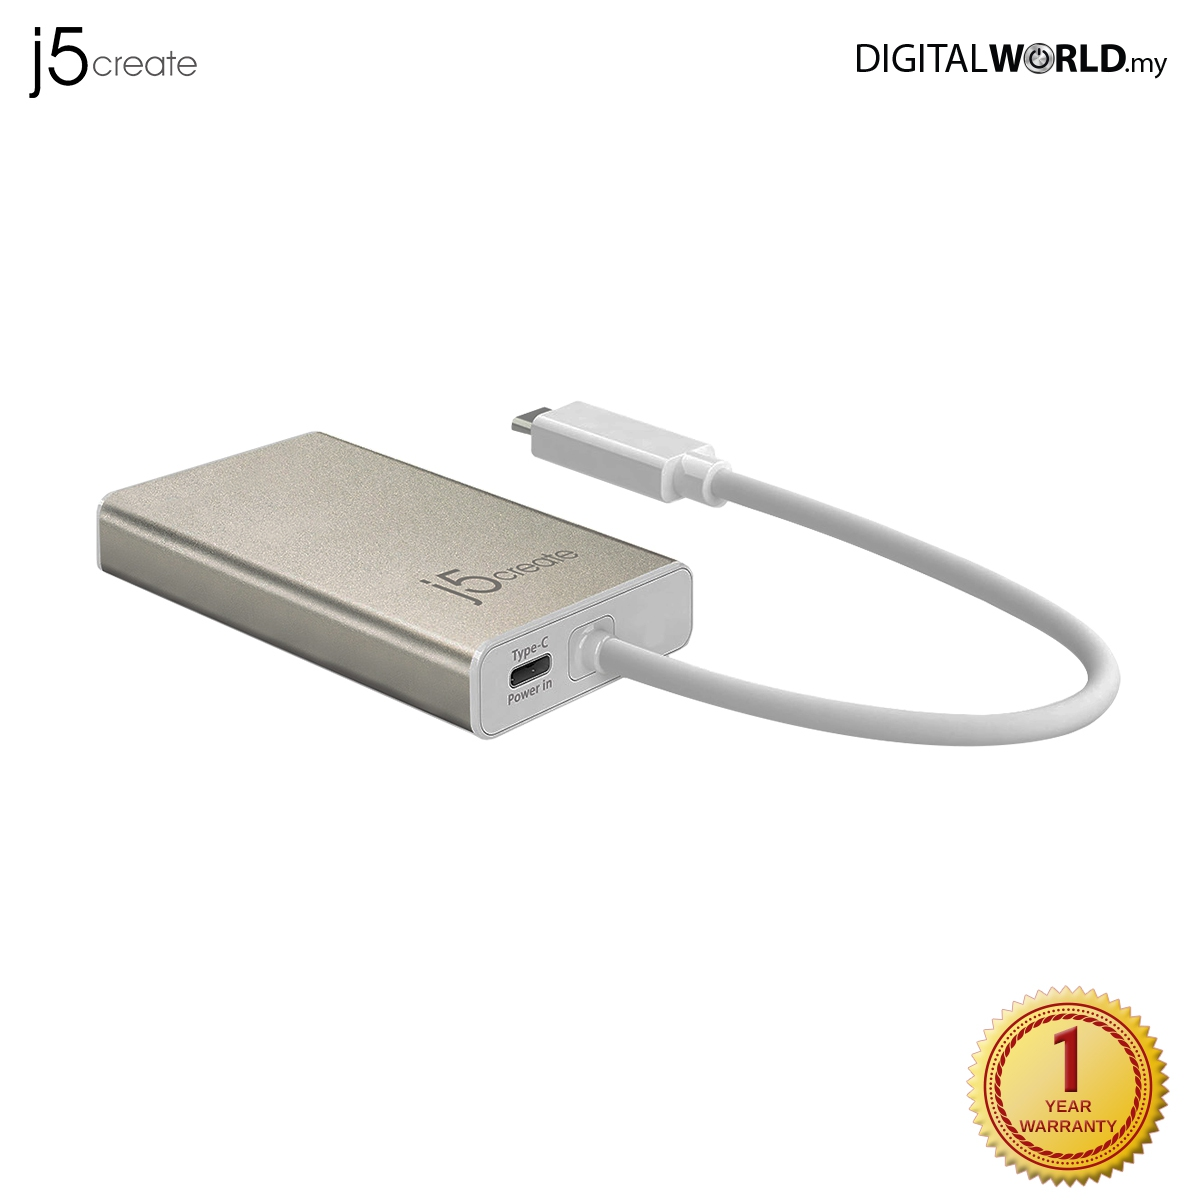 J5 Create Jca374 Usb Type-C To Hdmi/Ethernet/Usb3 0 Hub/Pd 2 0 Multi Adapter